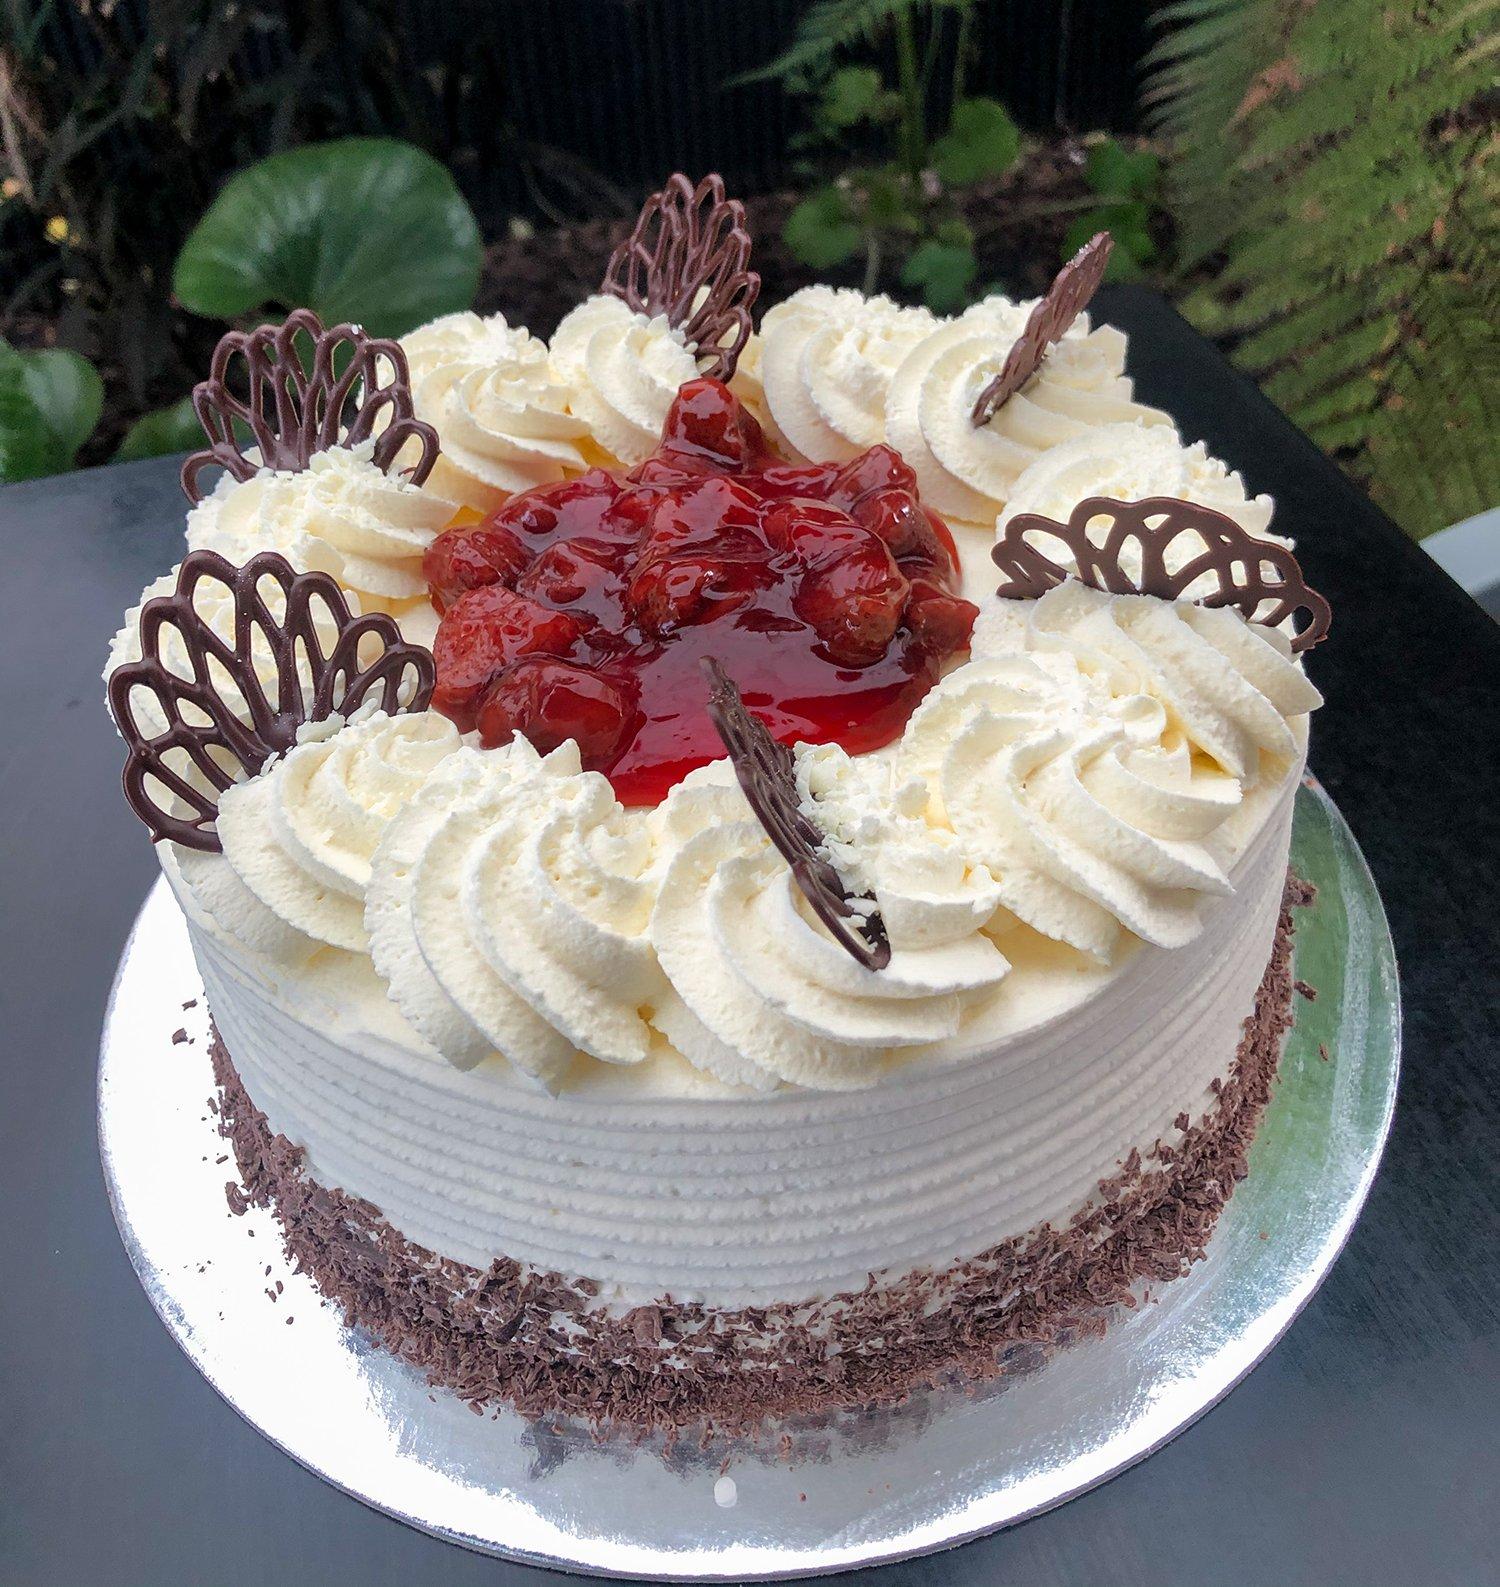 Strawberry Gateau - Kidd's Cakes & Bakery